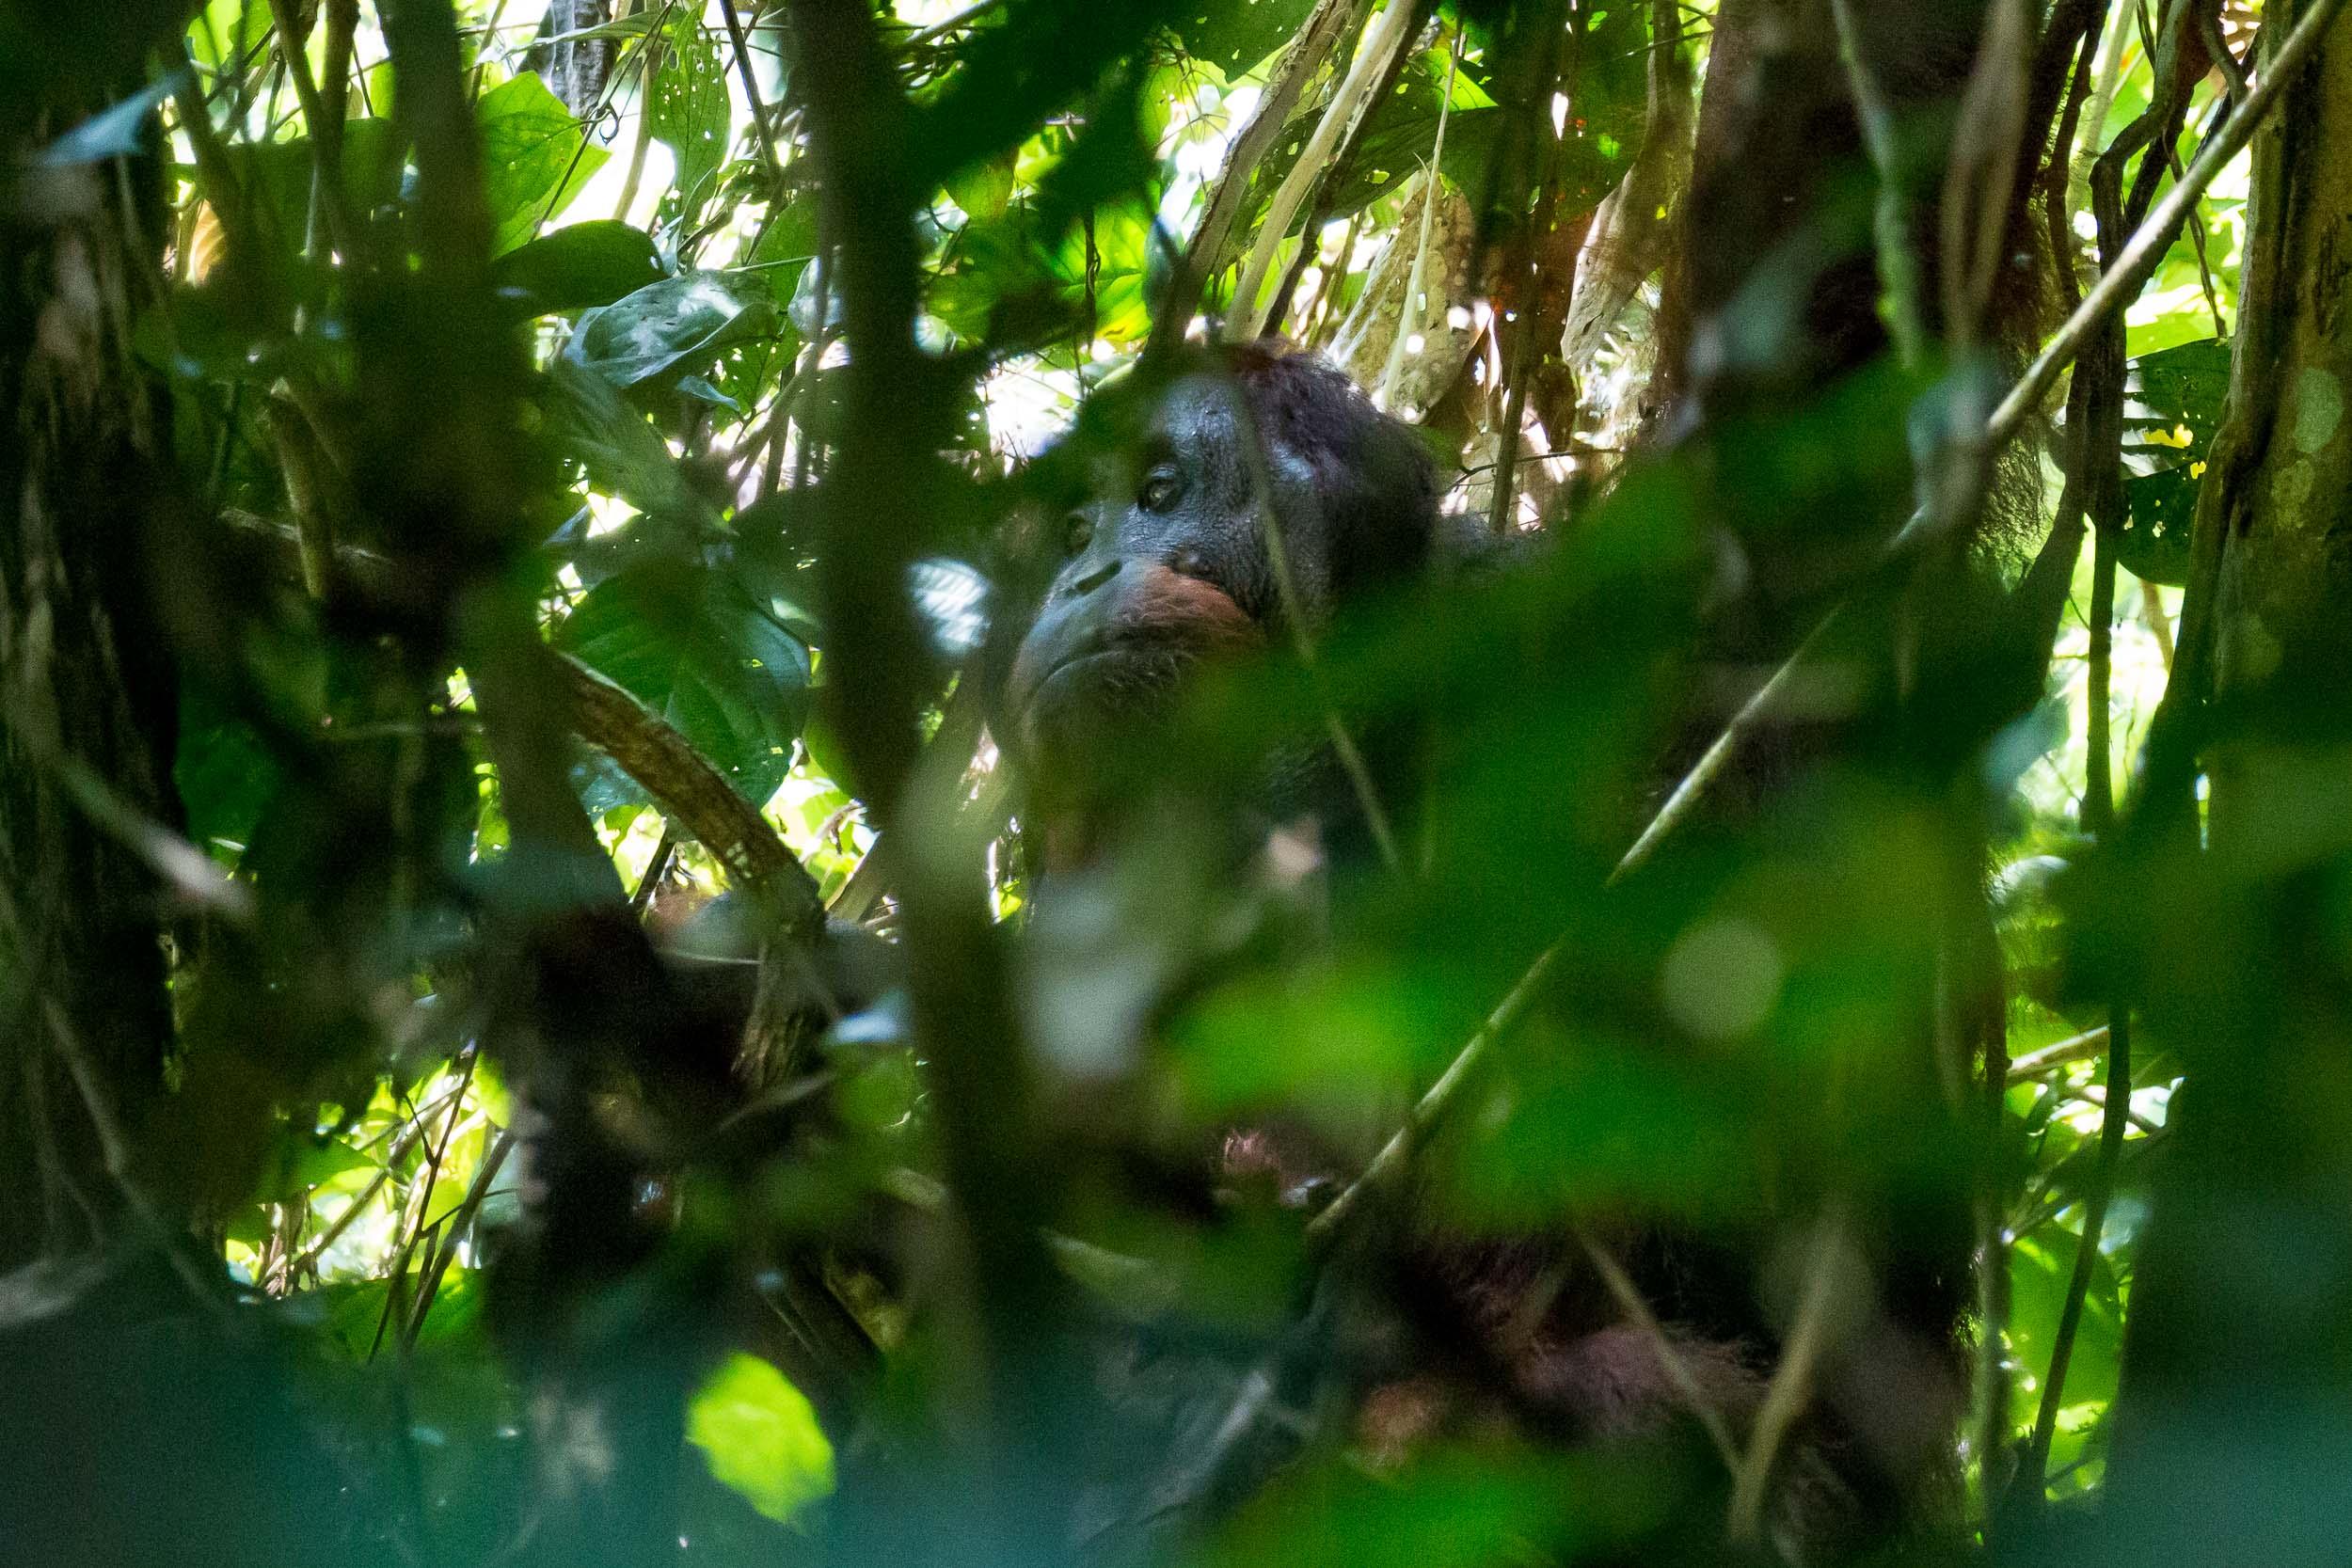 Large Male Orangutan with Flanged Cheeks eating, Danum Valley, Sabah, Borneo, Malaysia.jpg.jpg